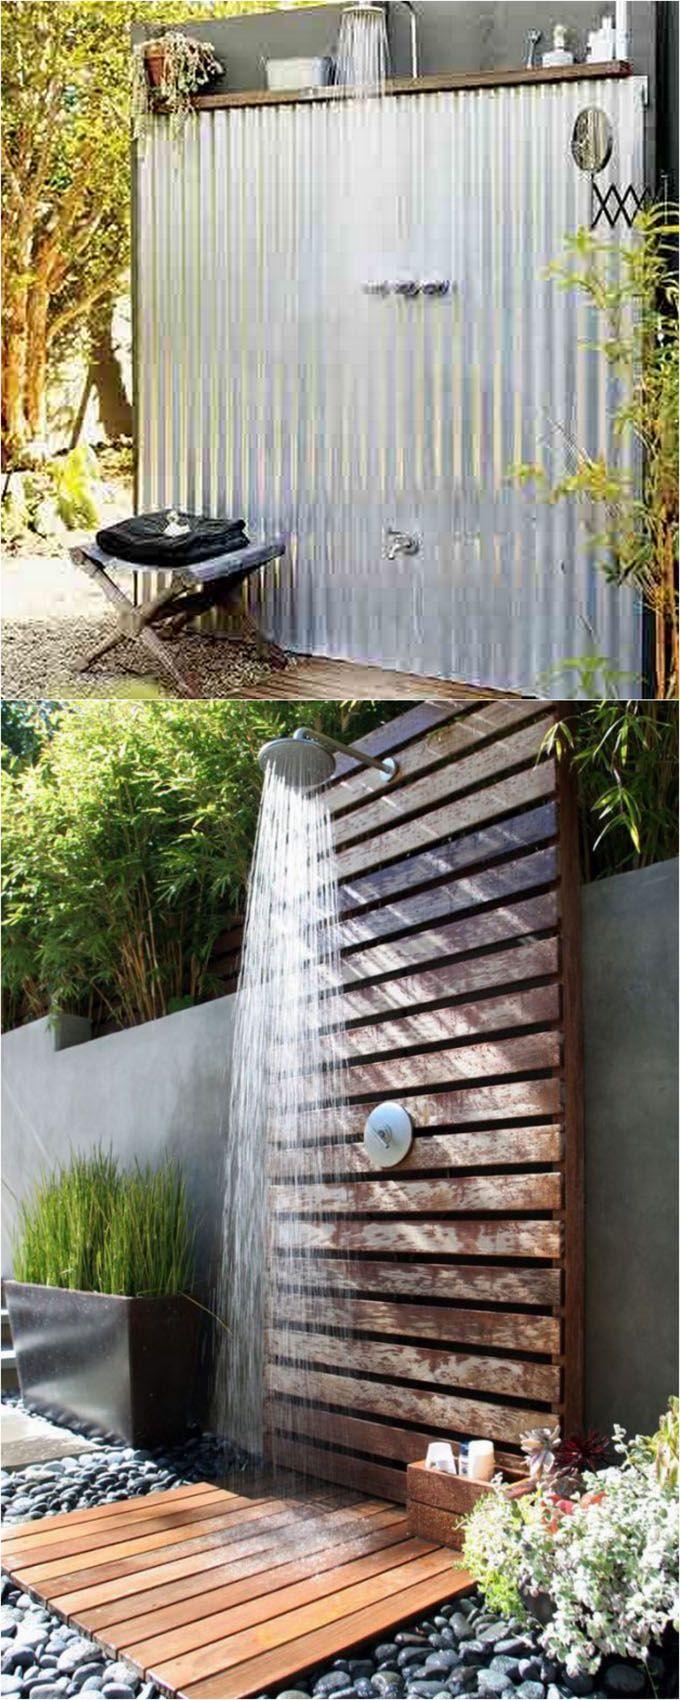 16 diy outdoor shower ideas shower fixtures creative. Black Bedroom Furniture Sets. Home Design Ideas